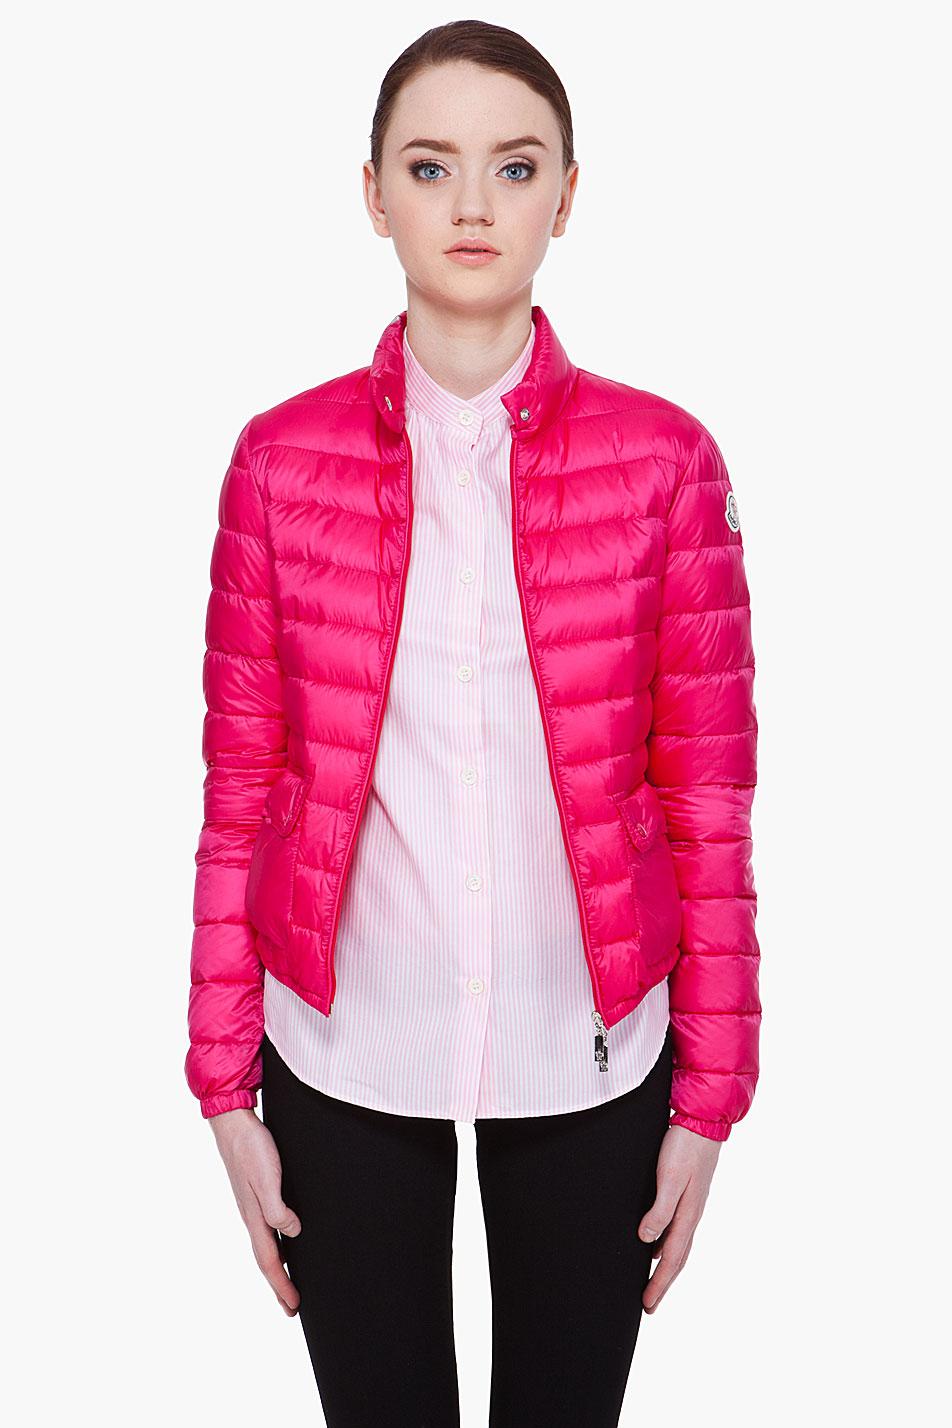 moncler pink jacket